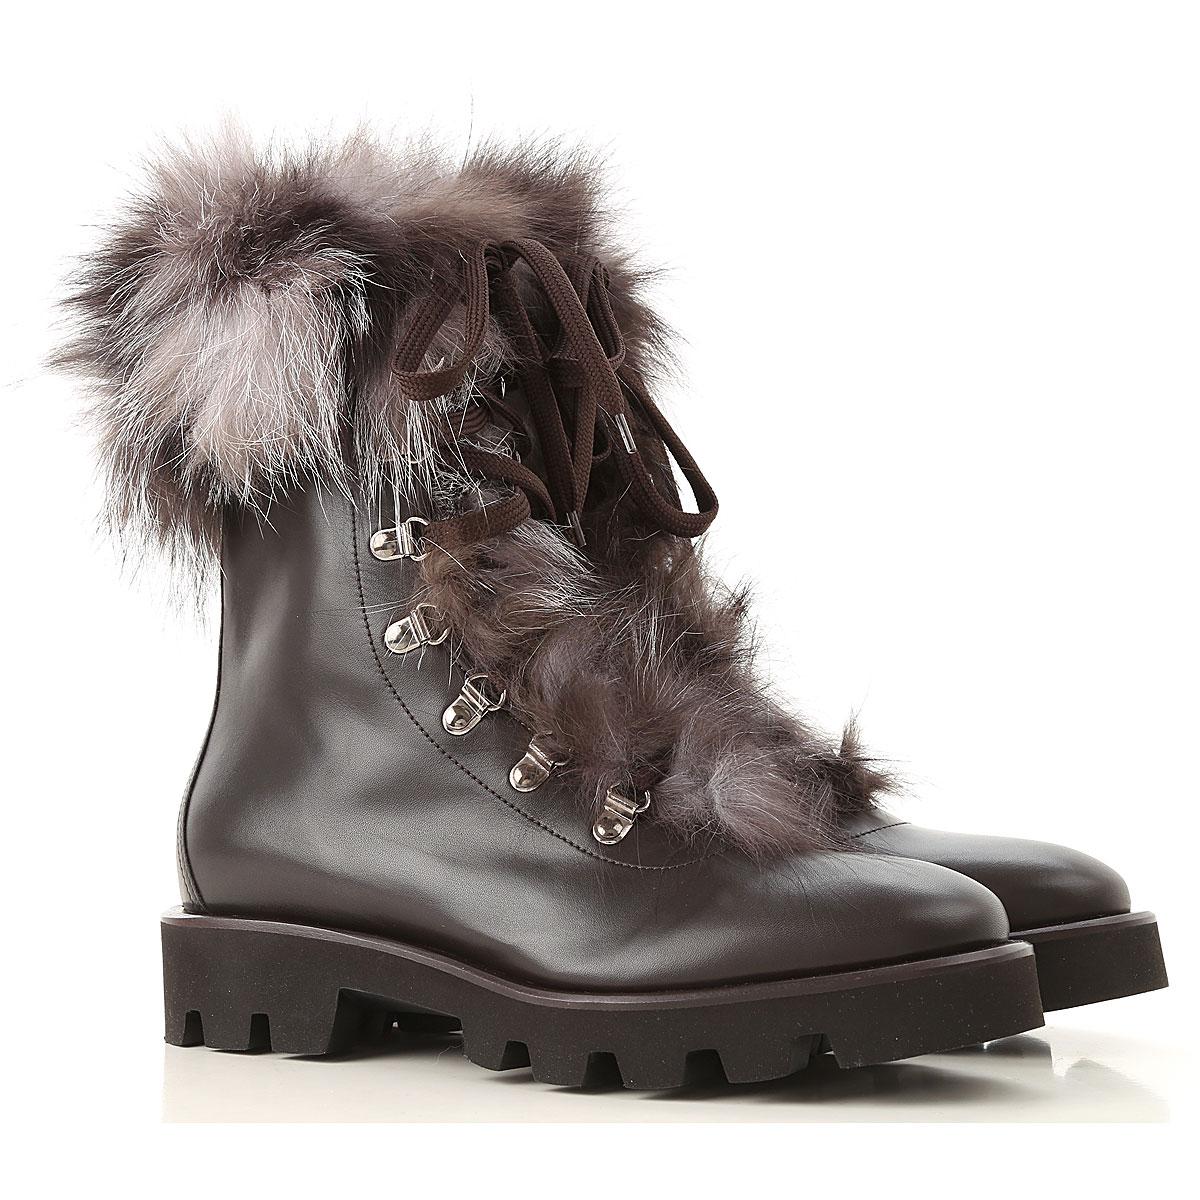 Image of Fabiana Filippi Boots for Women, Booties, Dark Ebony, Leather, 2017, 10 6 7 8 9